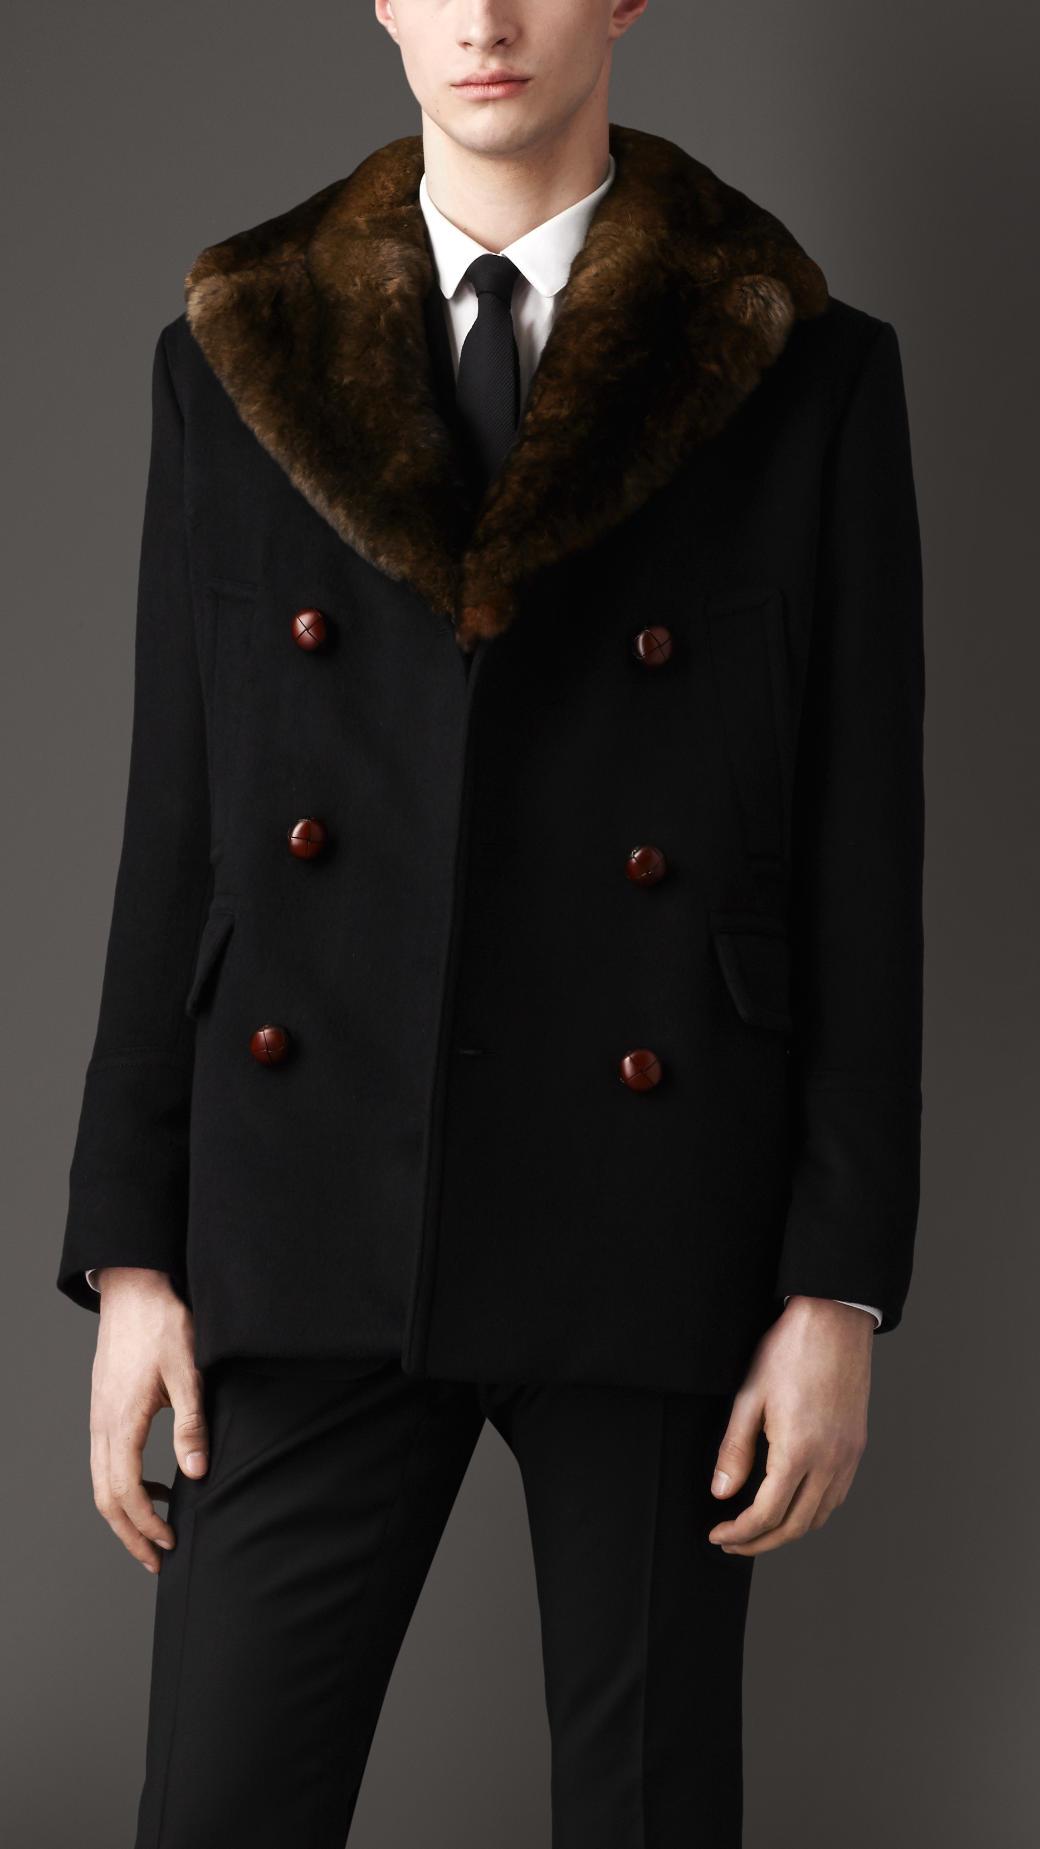 Burberry Fur Collar Pea Coat In Black For Men Lyst